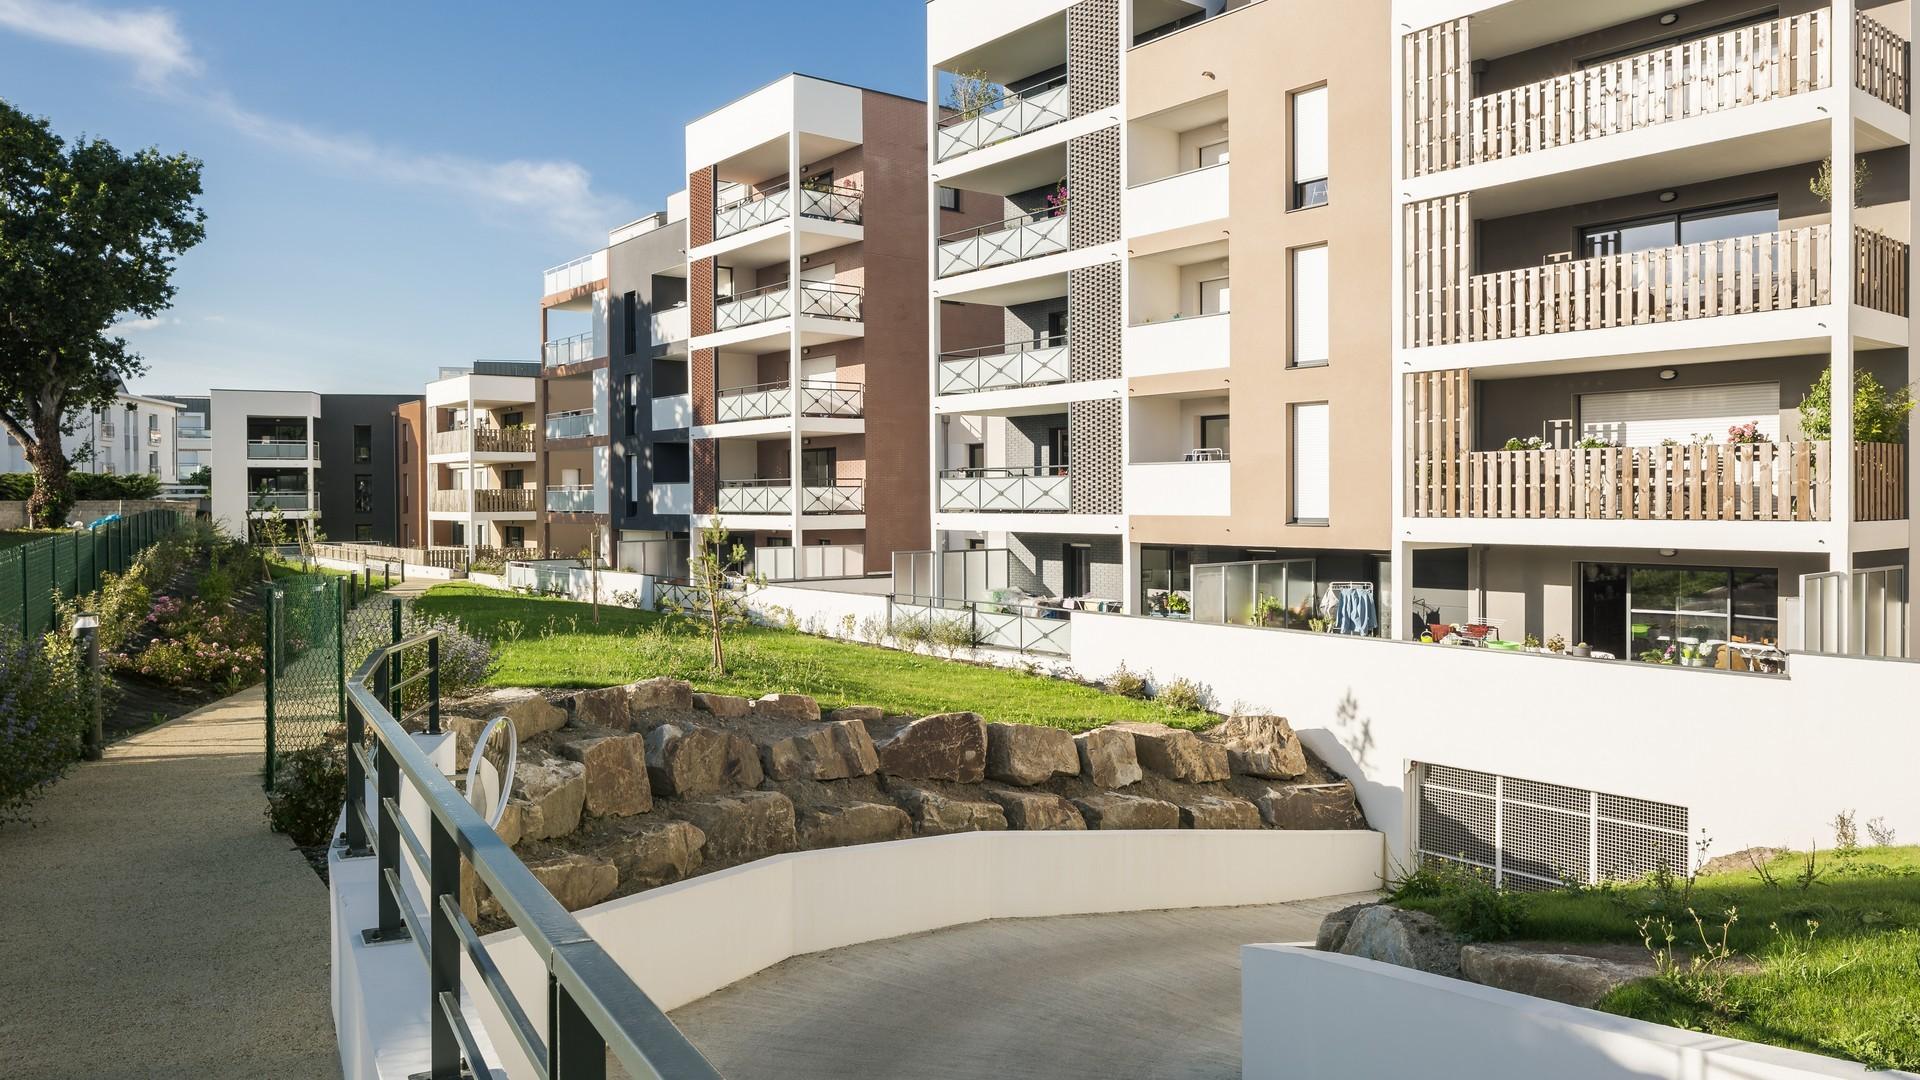 51 logements Quai Ampère à Dinard